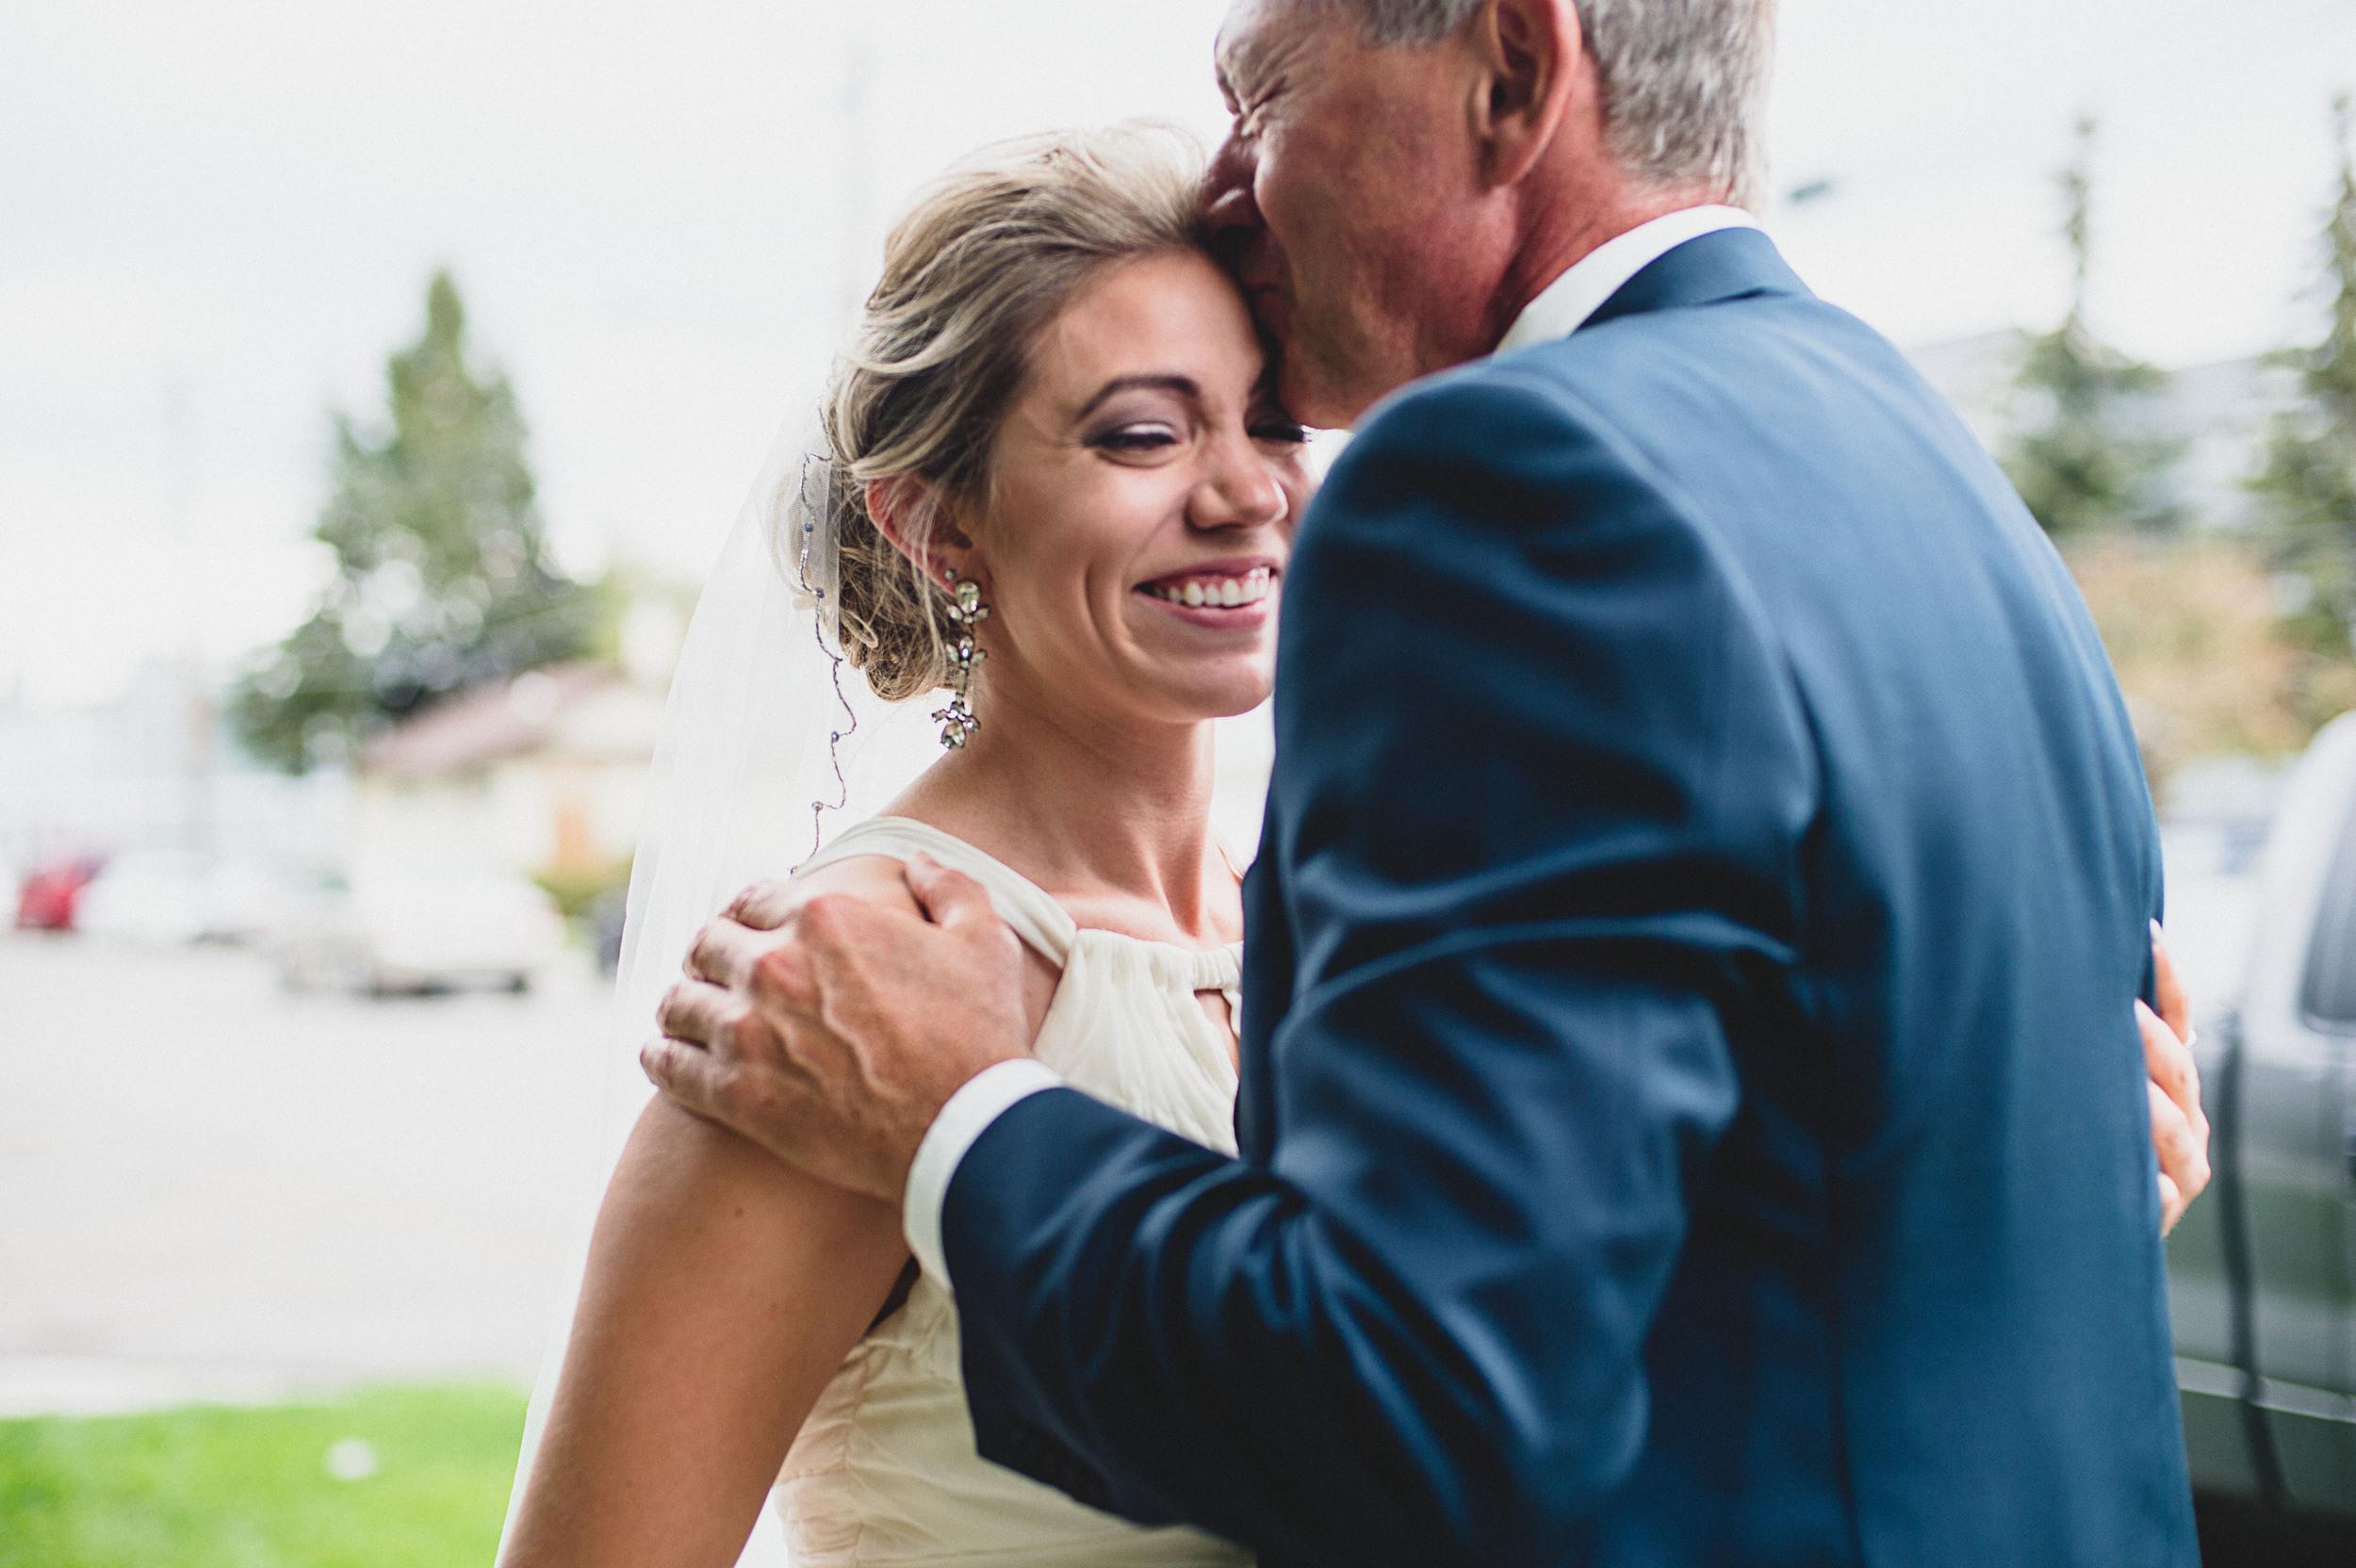 Vancouevr wedding photography edward lai photogrpaher -7.jpg